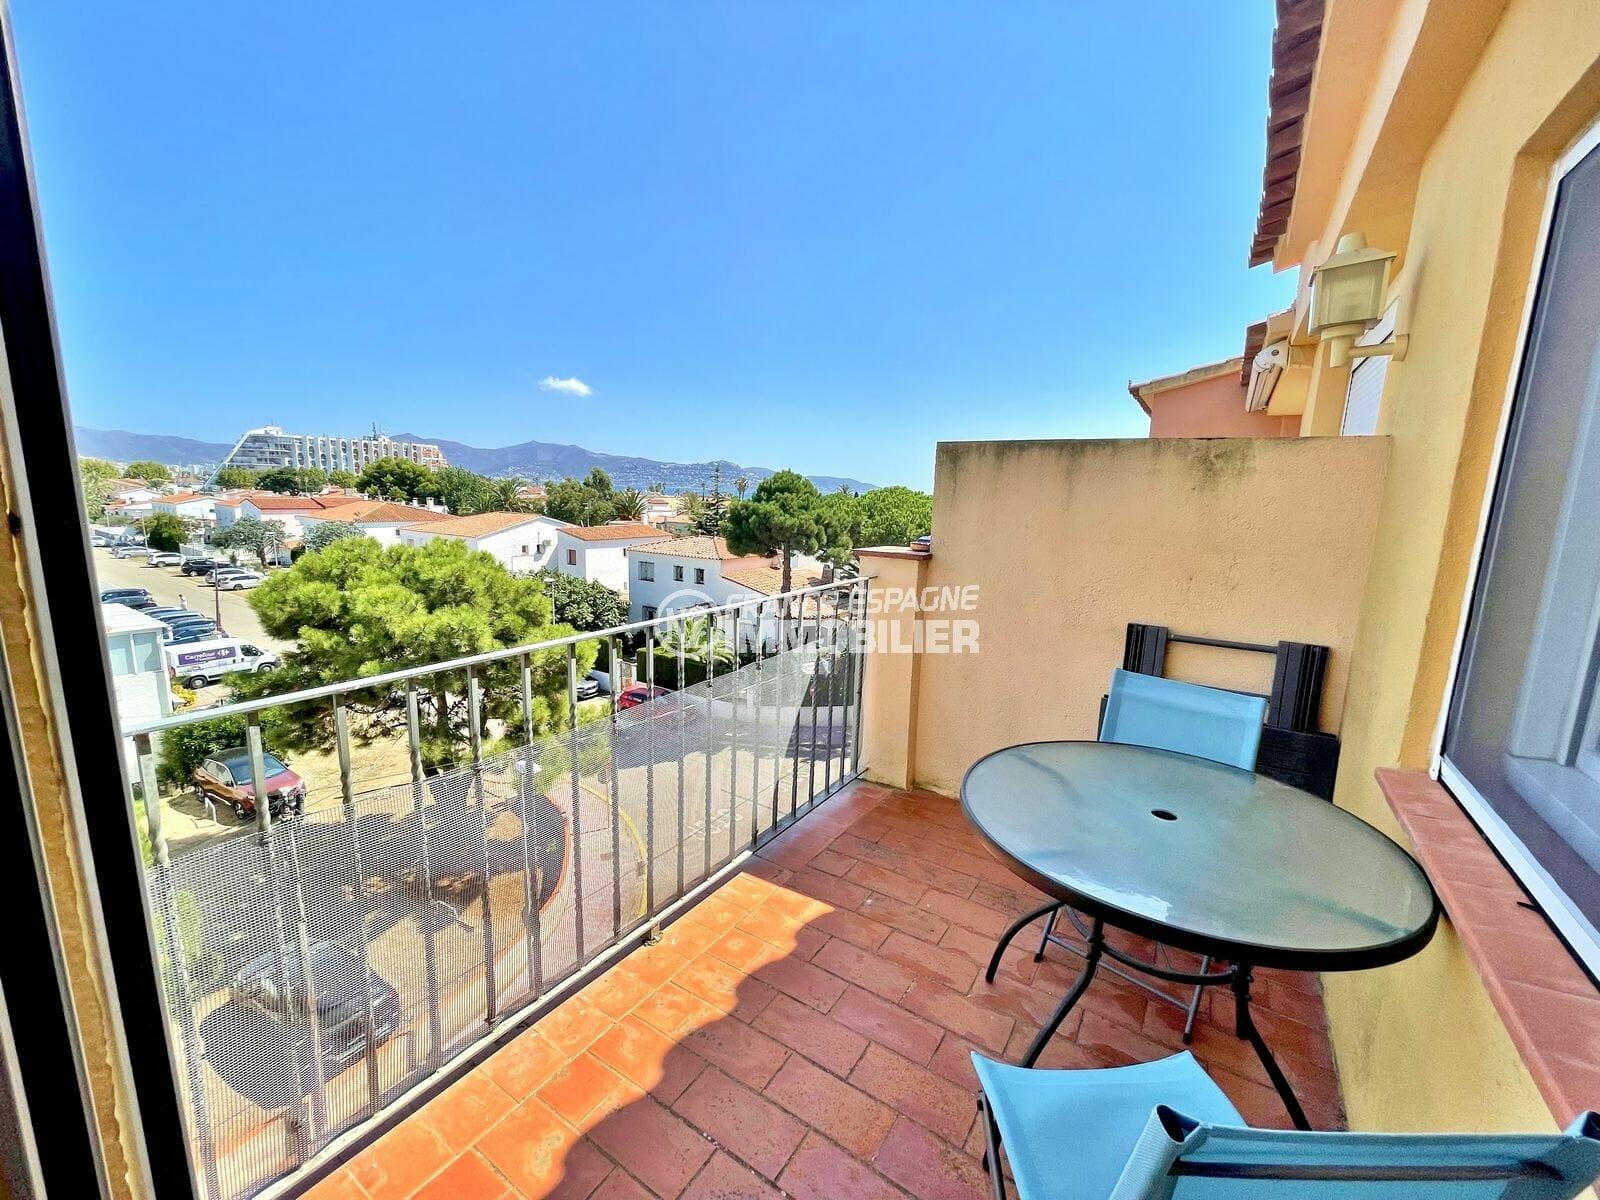 appartement a vendre empuriabrava, 2 pièces atico 42 m², balcon et terrasse solarium vue mer